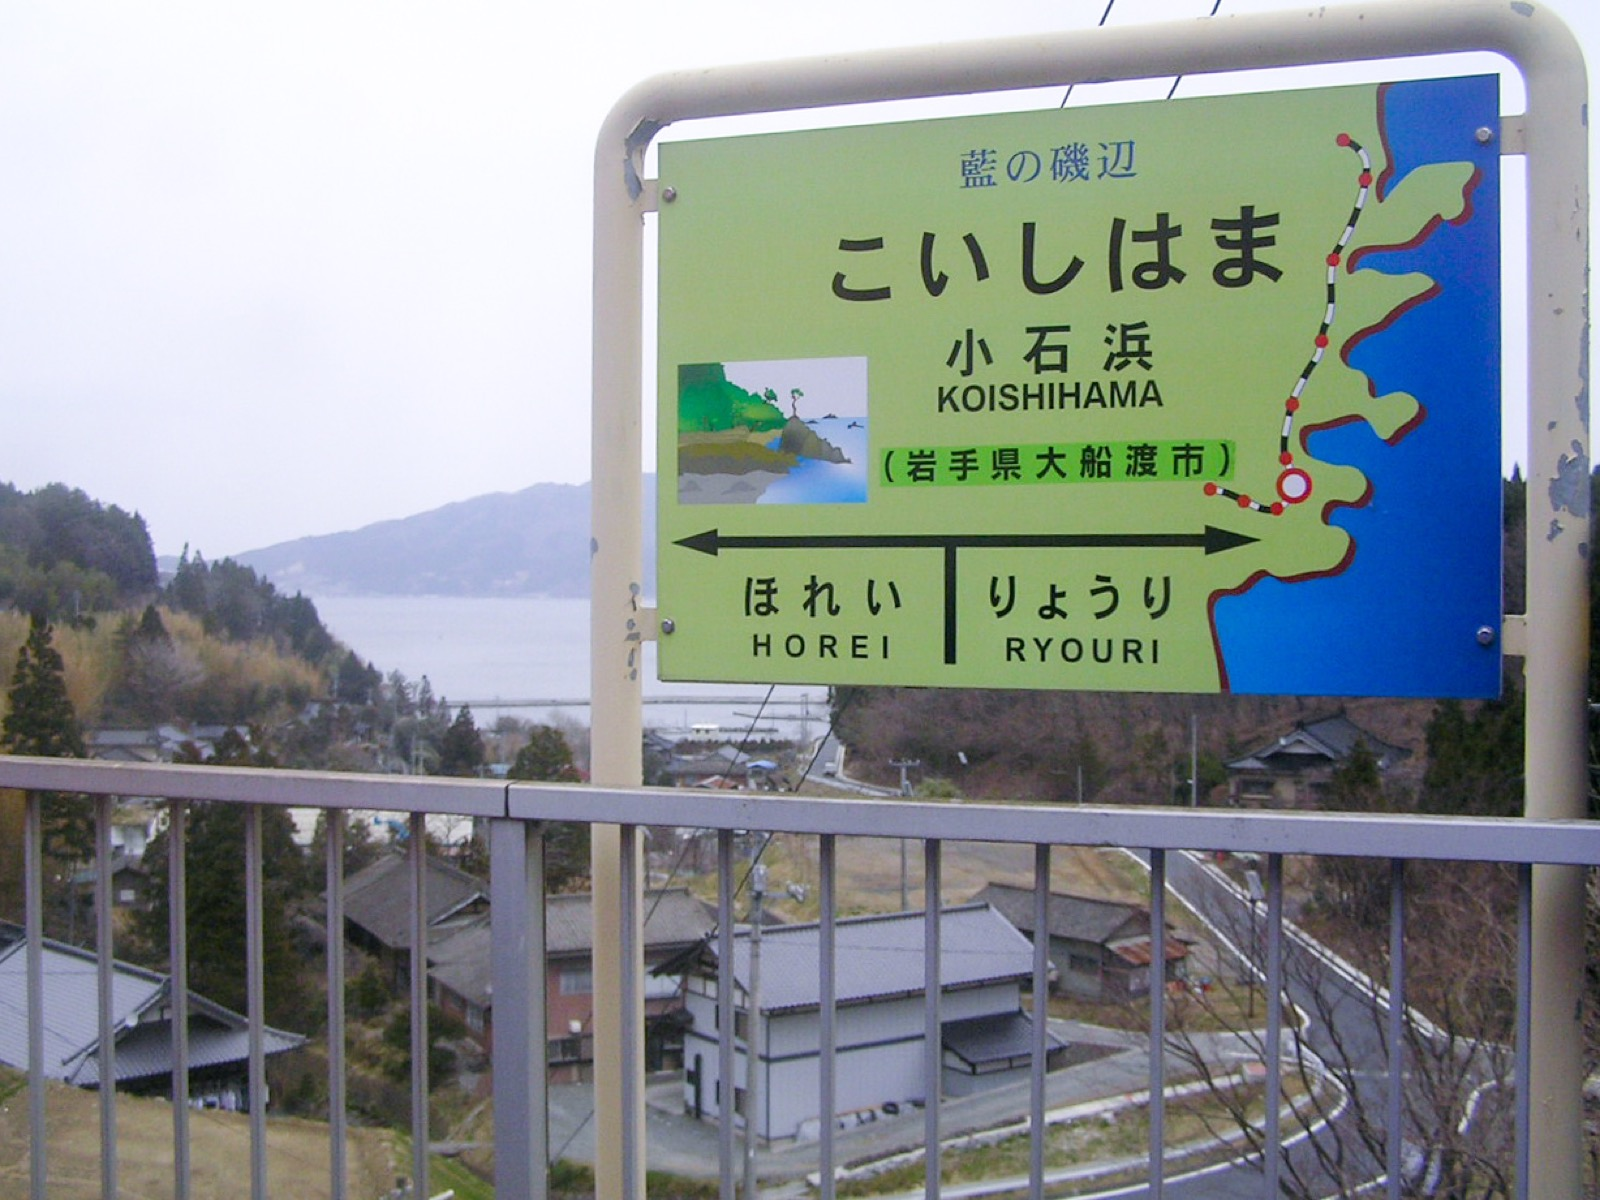 2007年の小石浜駅(現・恋し浜駅)(2007年3月)